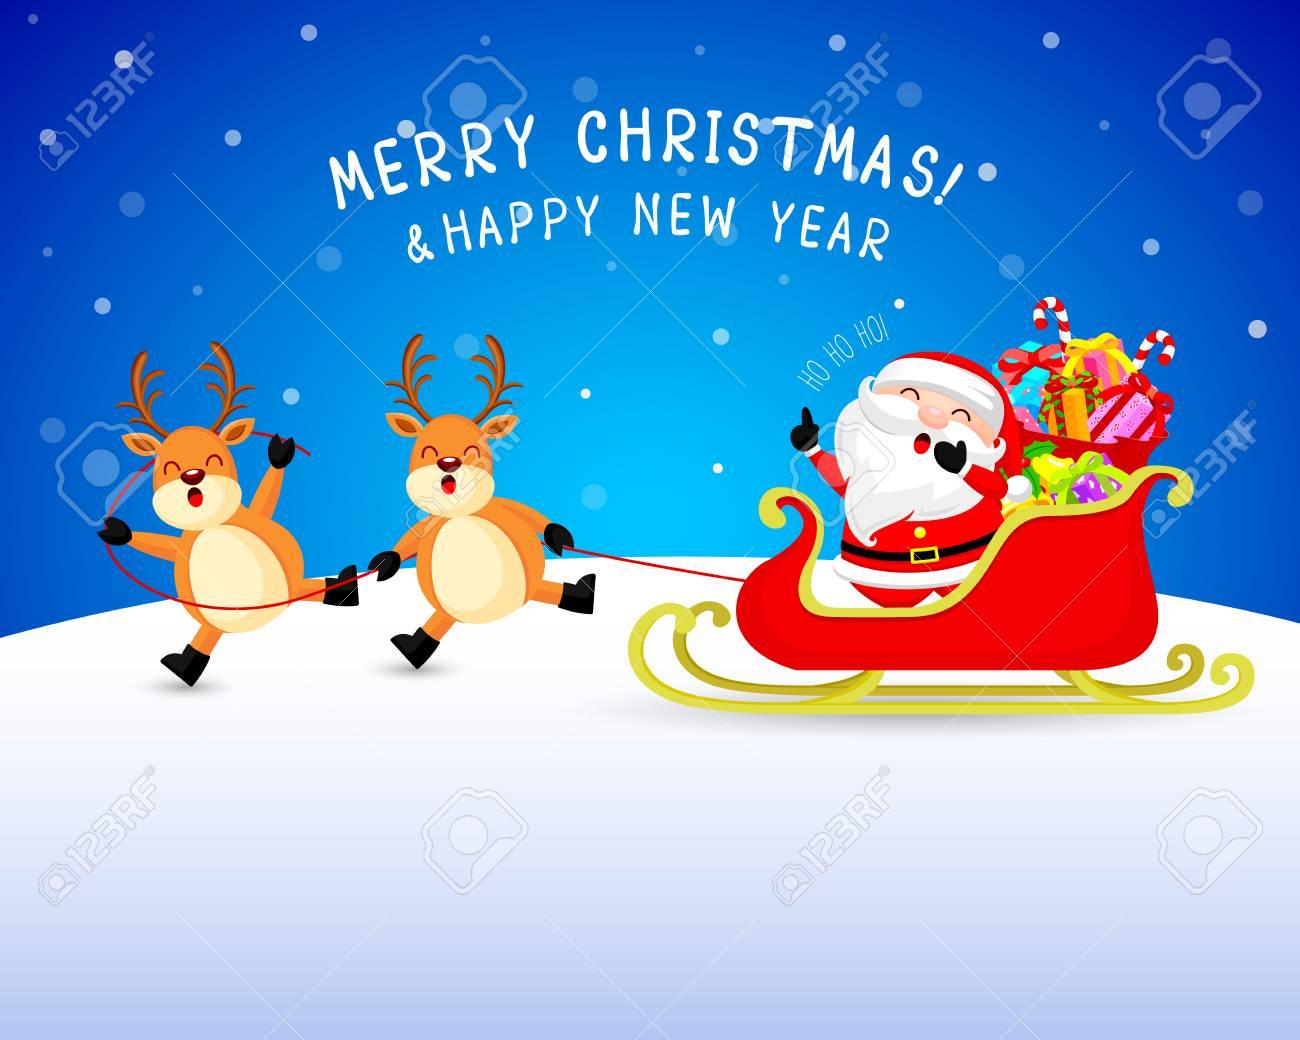 Christmas greeting card design concept royalty free cliparts christmas greeting card design concept stock vector 89760408 kristyandbryce Choice Image